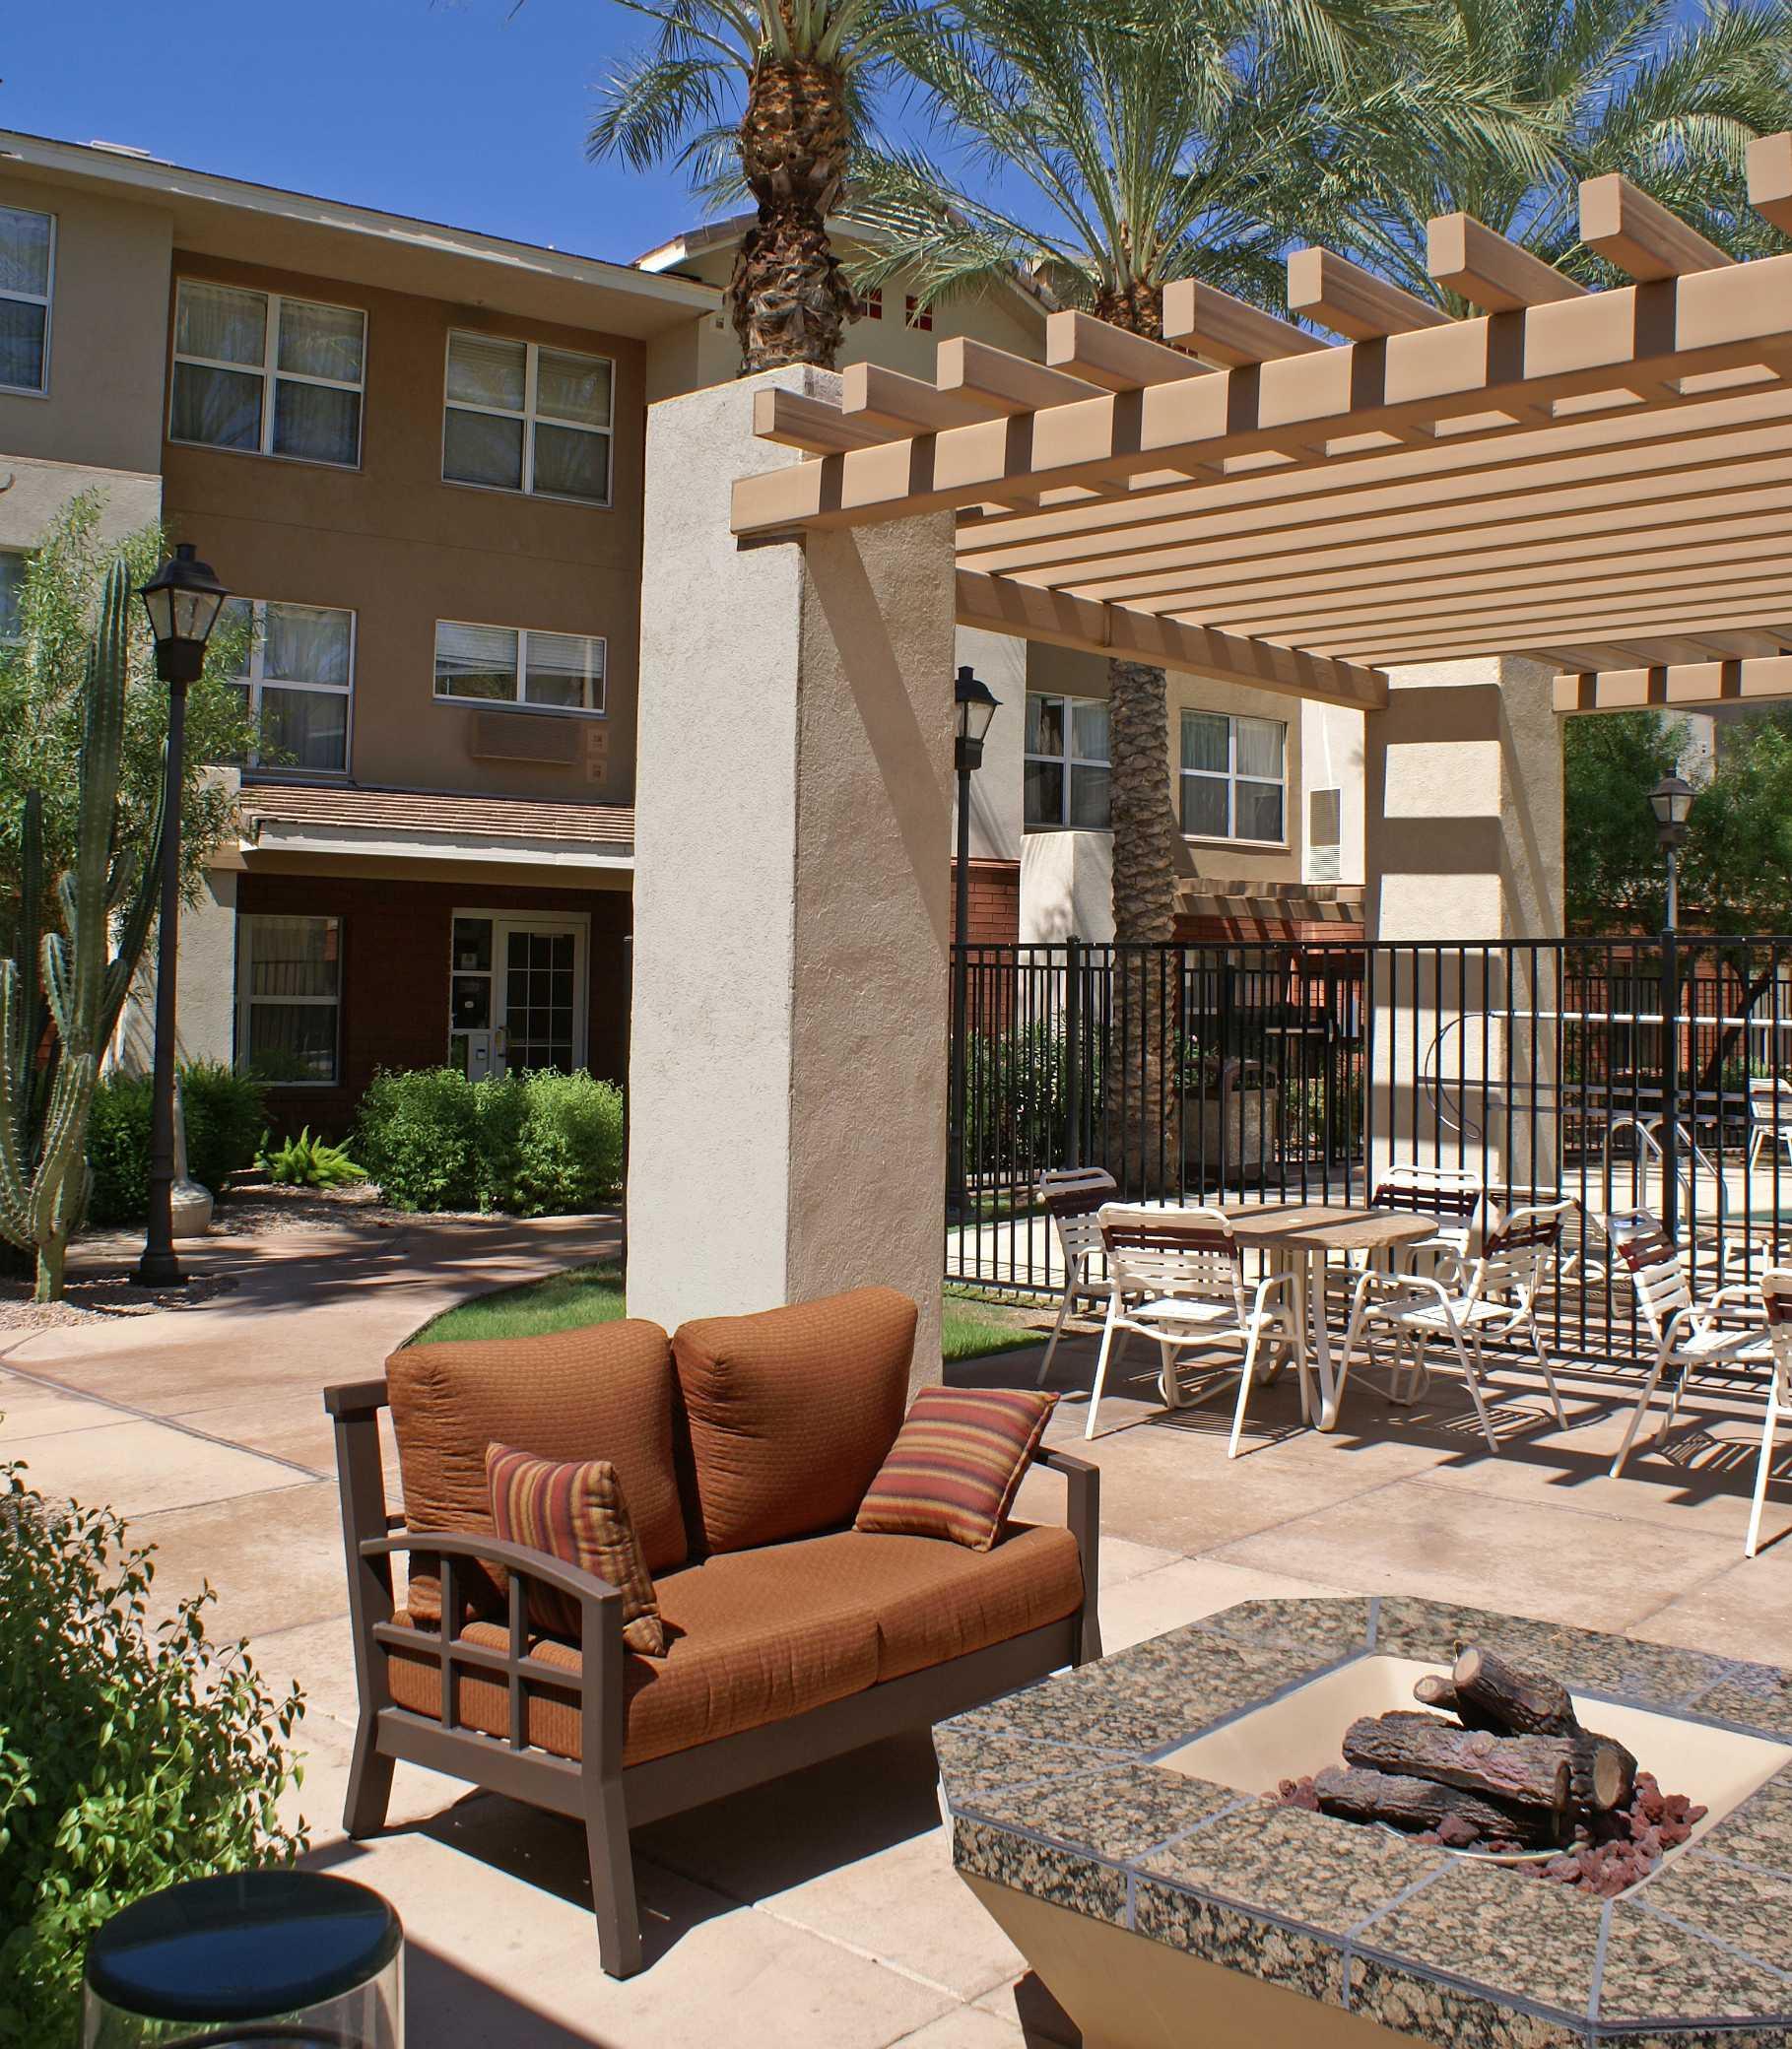 Residence Inn by Marriott Scottsdale North image 6